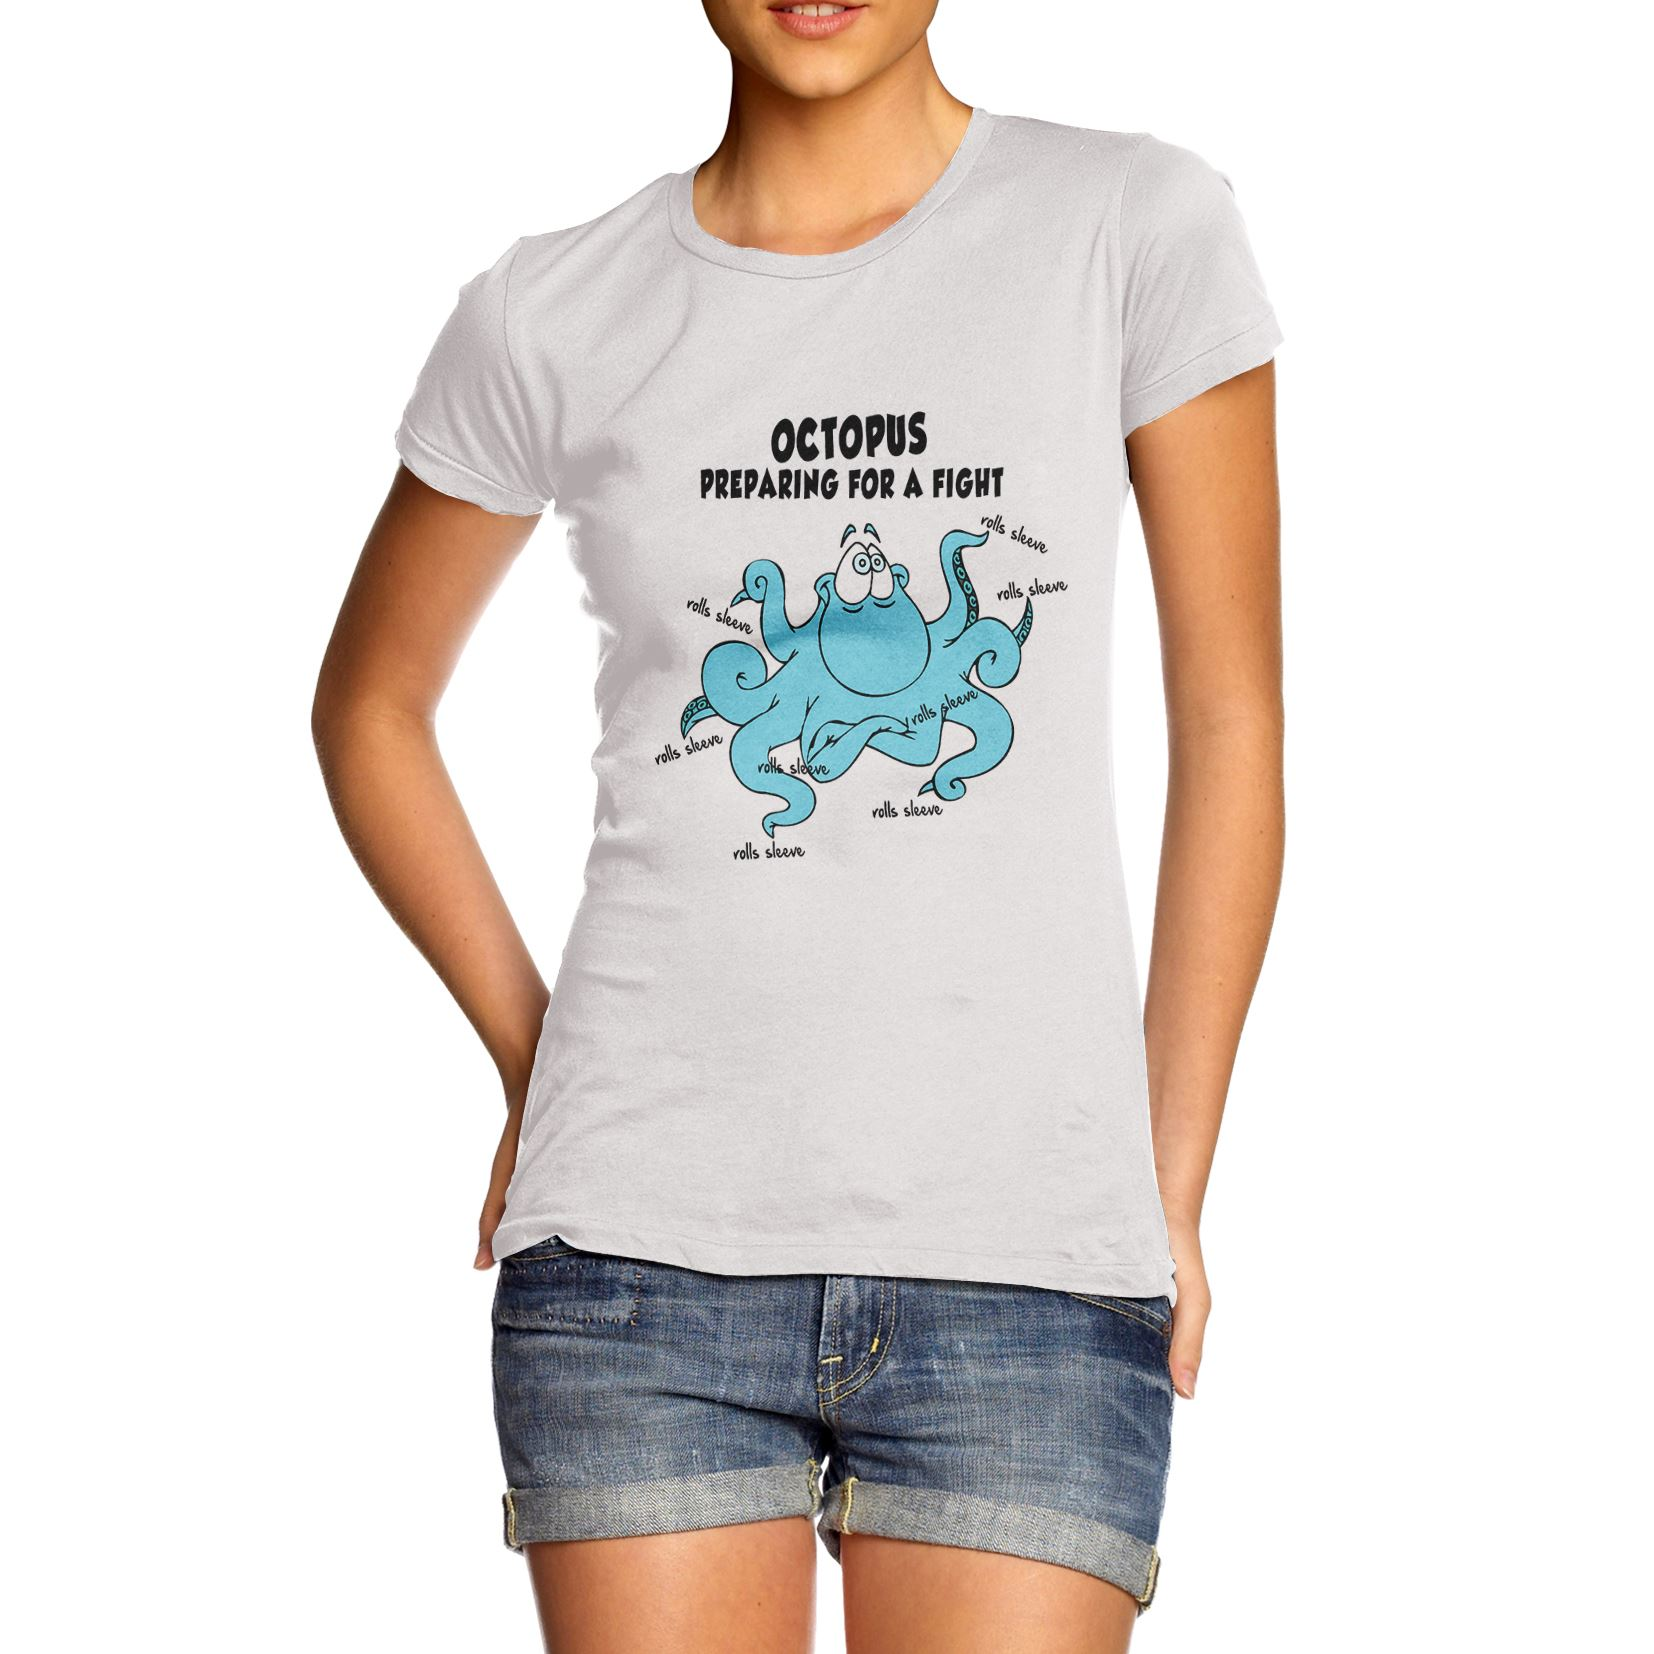 Shirt design octopus - Womens Cotton Novelty Funny Design Octopus Preparing For